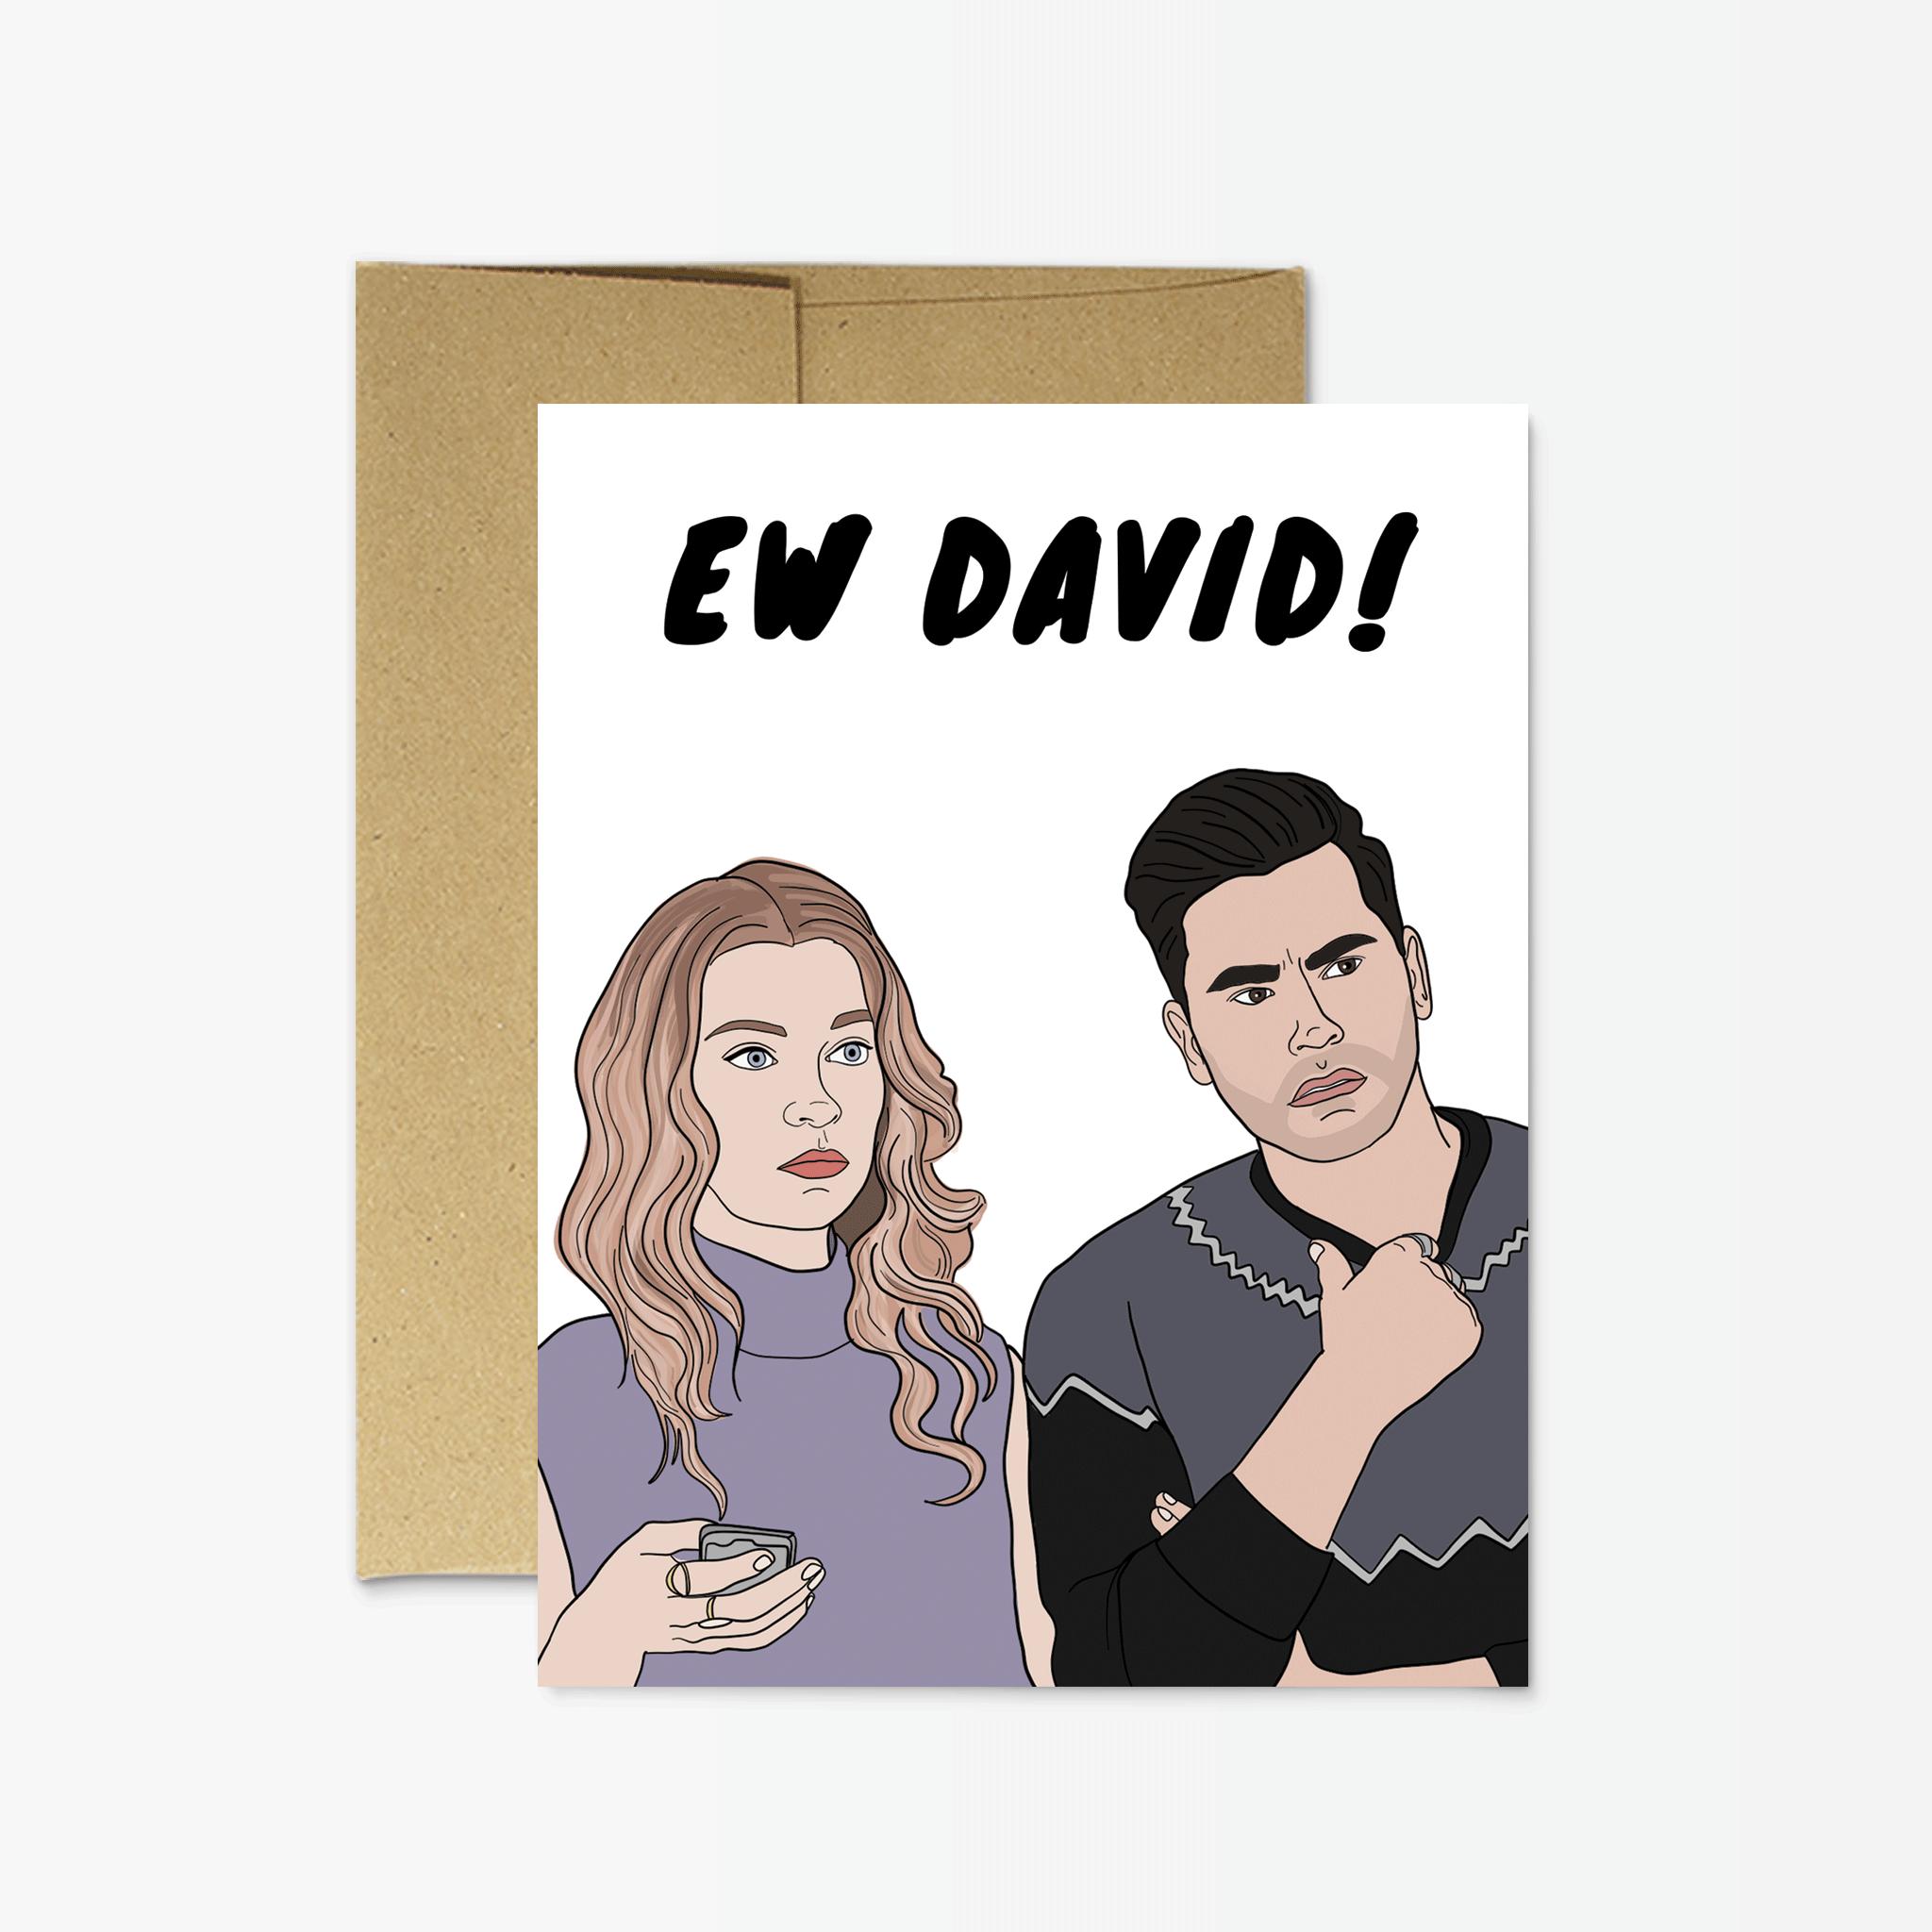 David Letterpress Card Ewww